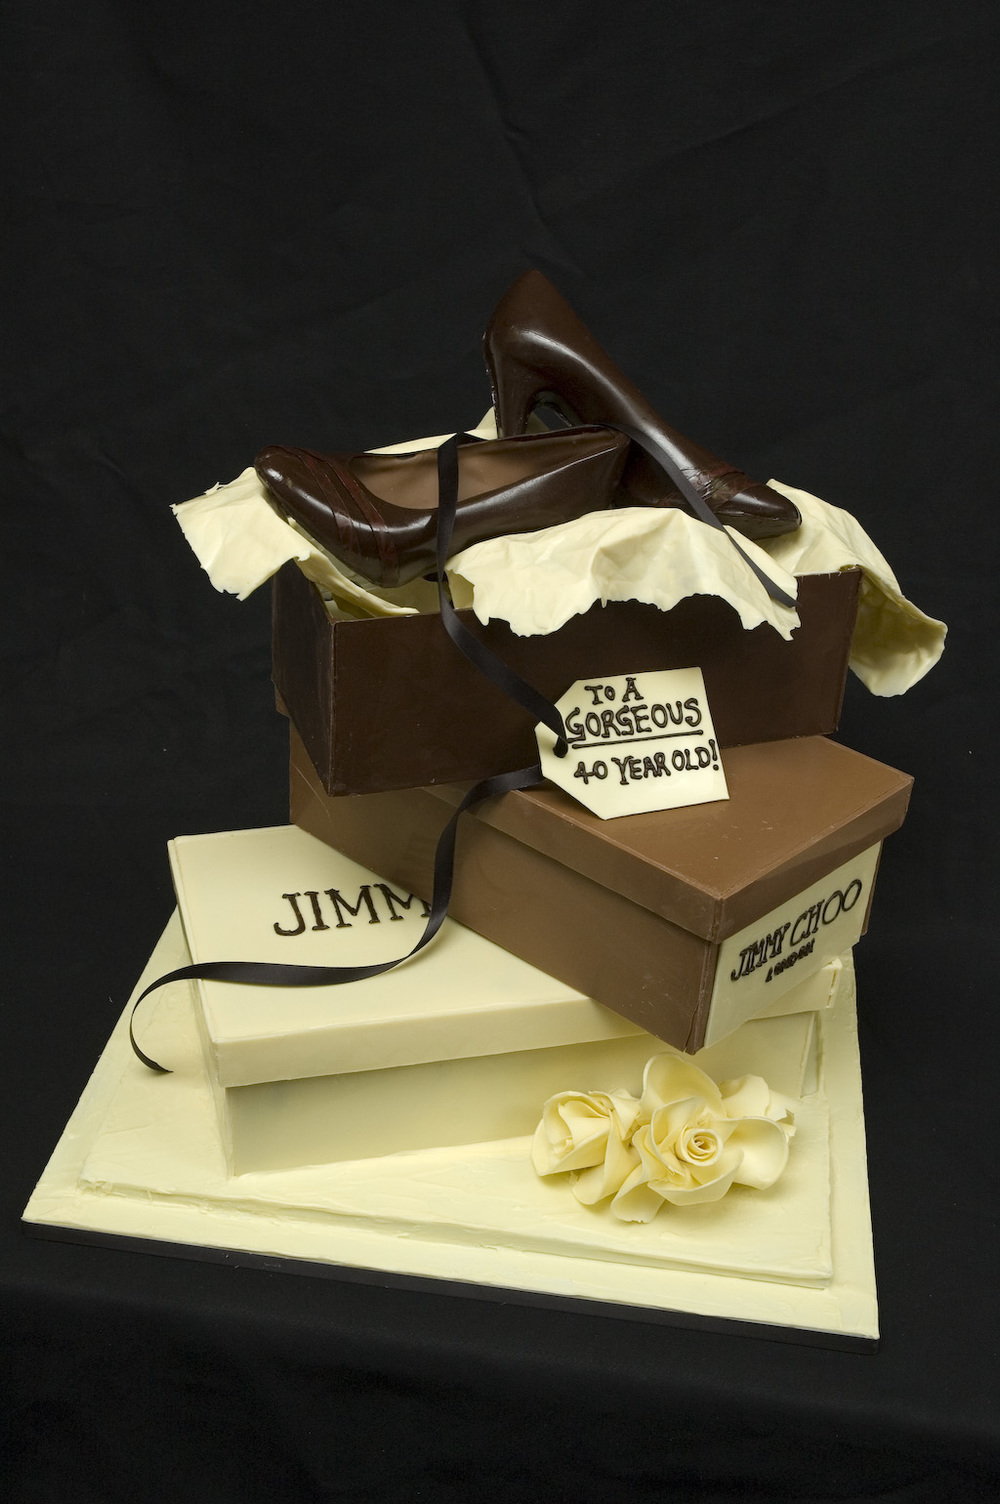 Jimmy Choo Cake sm 03.jpg